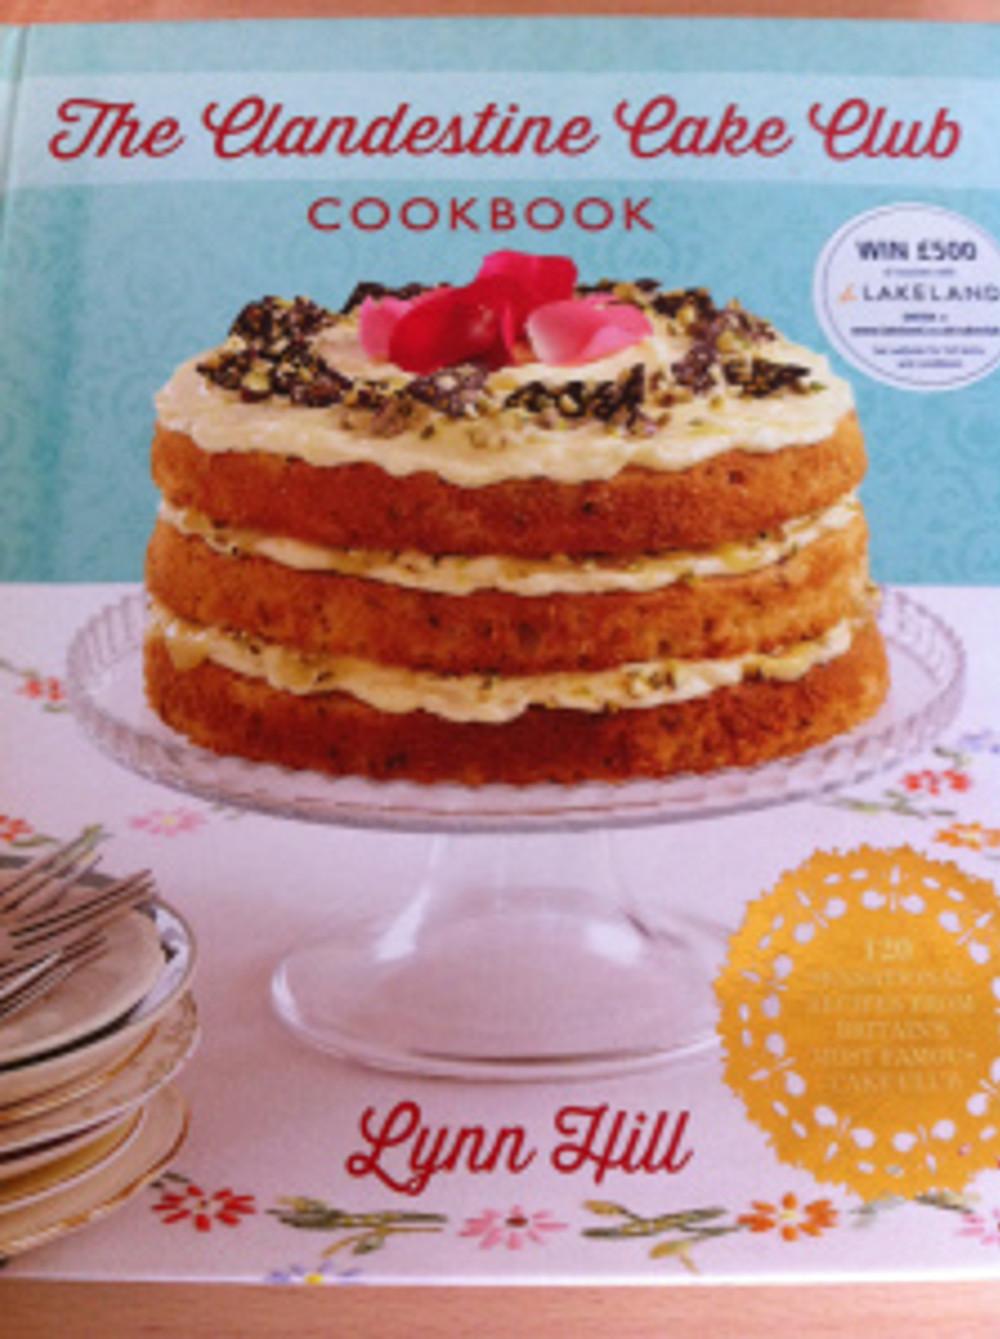 The pretty pastel retro feel front cover of The Clandestine Cake Club Cookbook